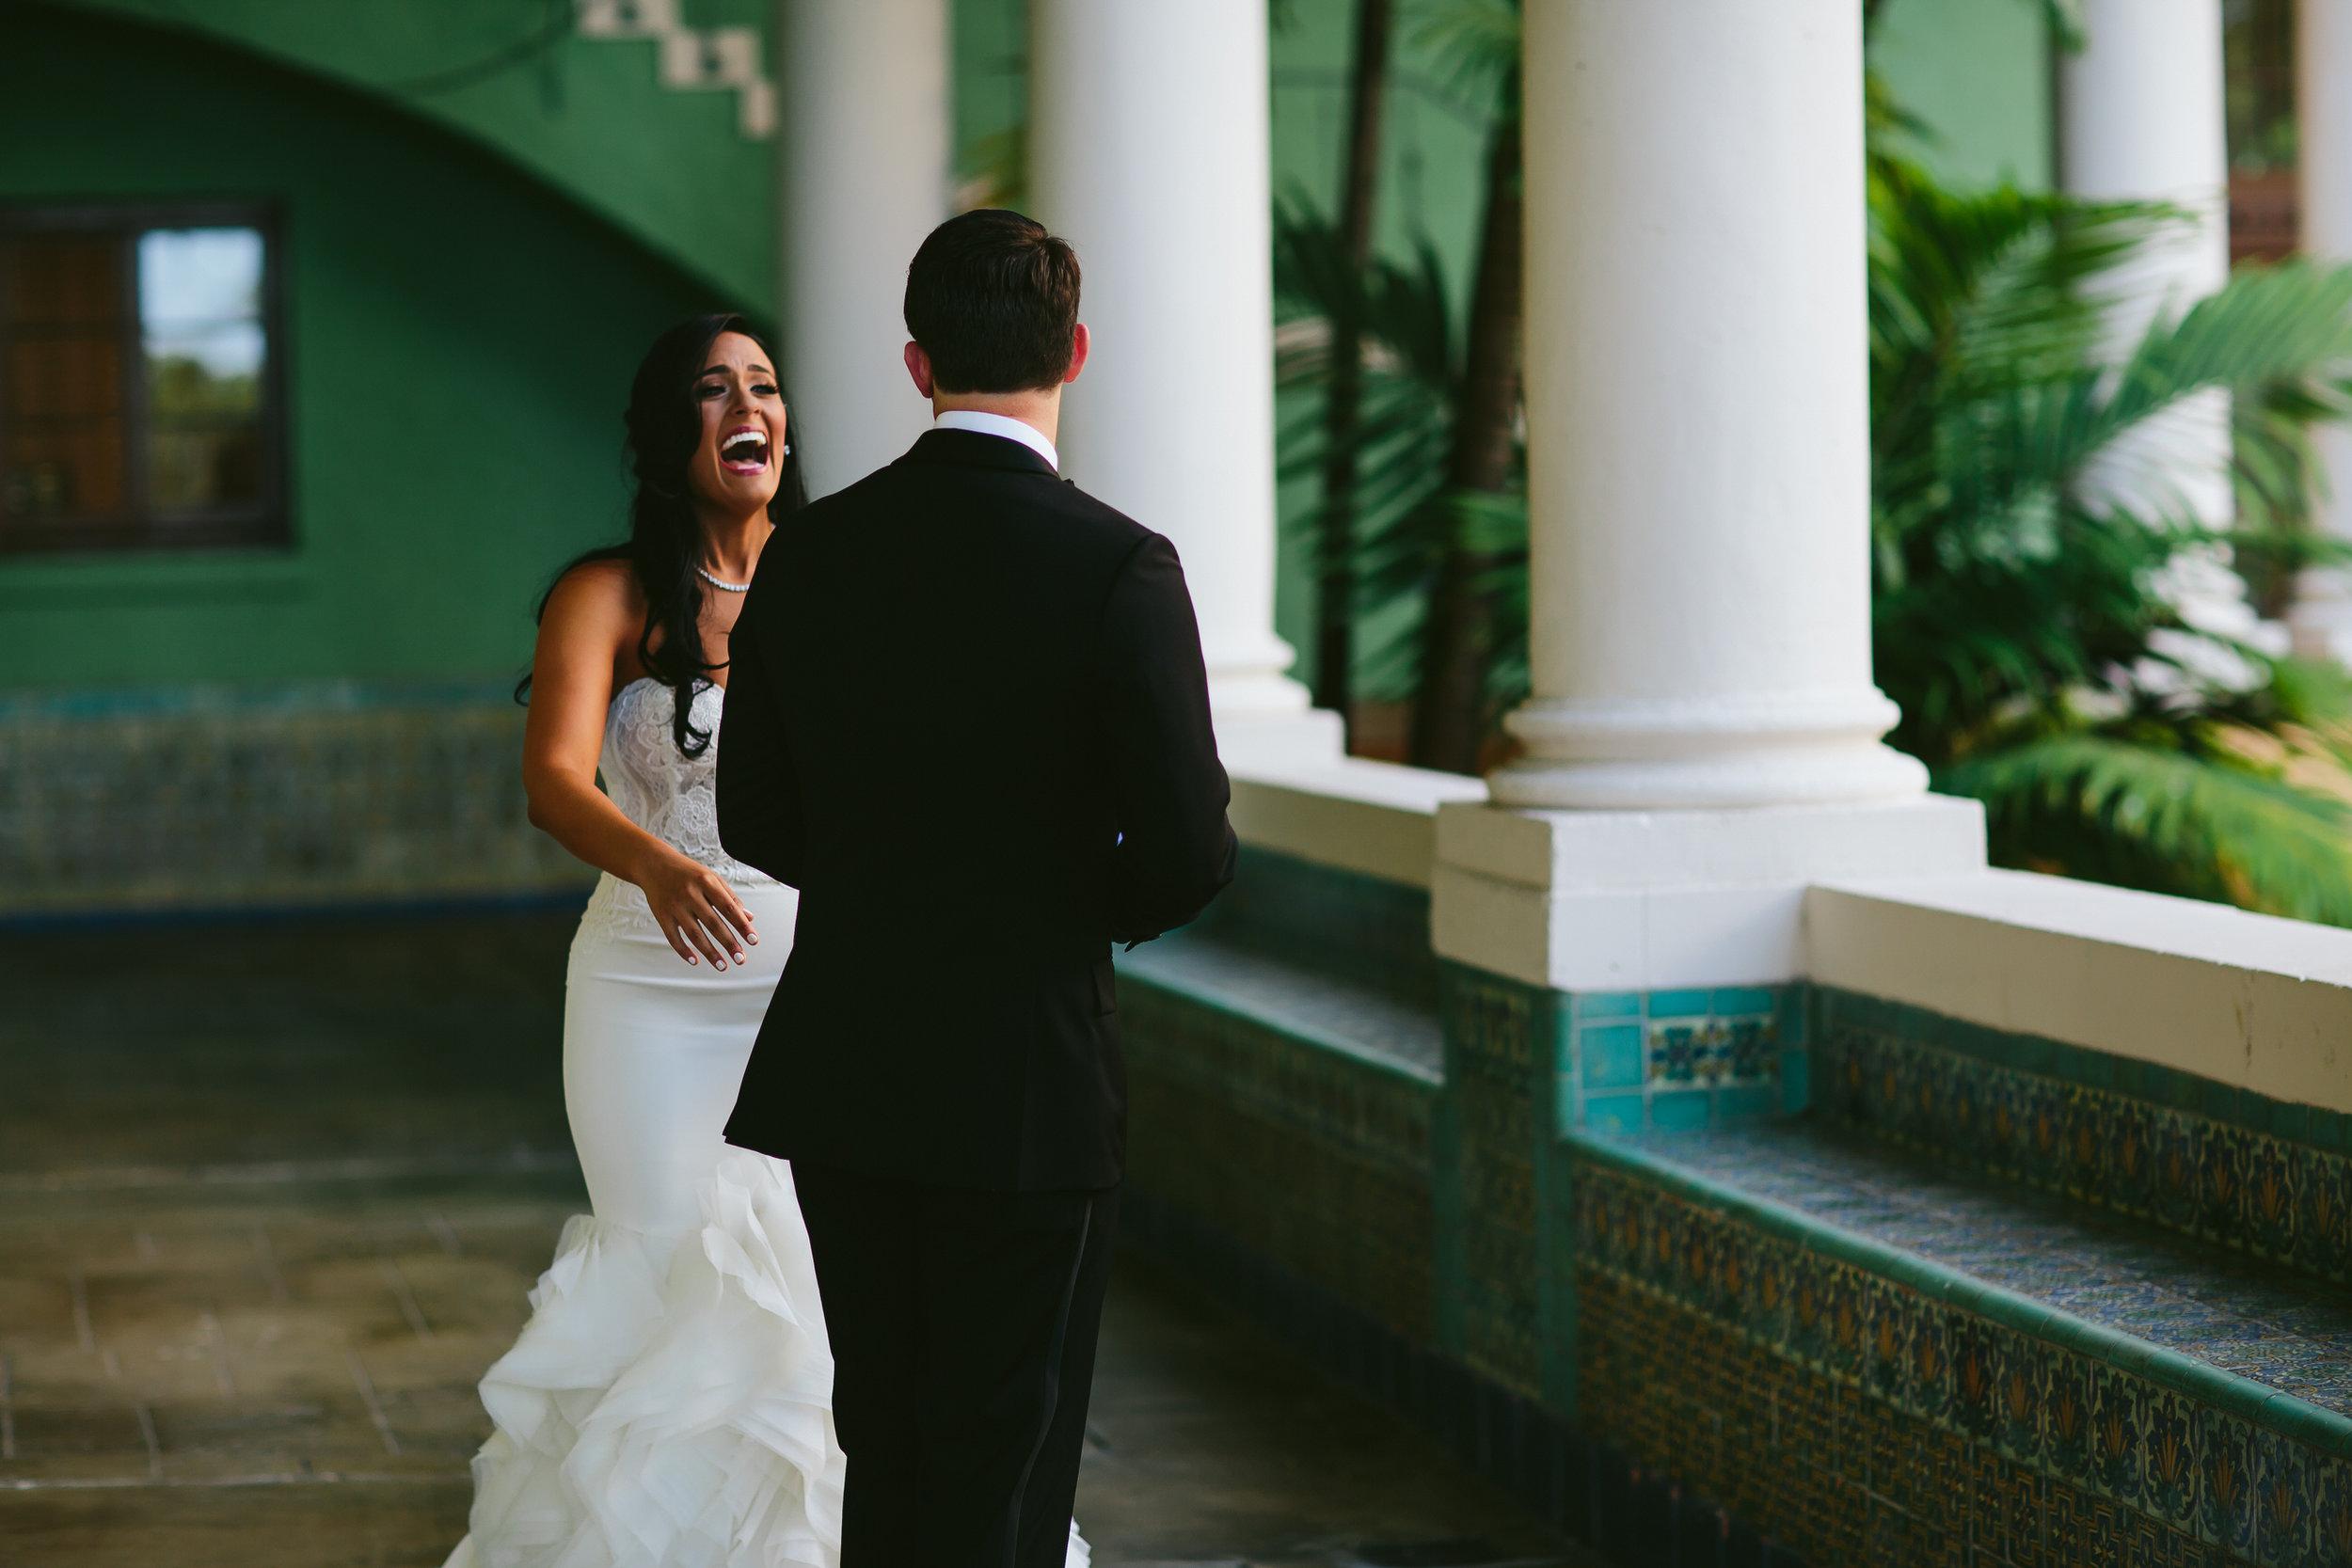 biltmore-wedding-steph-lynn-photo-photographer-bride-and-groom-4.jpg